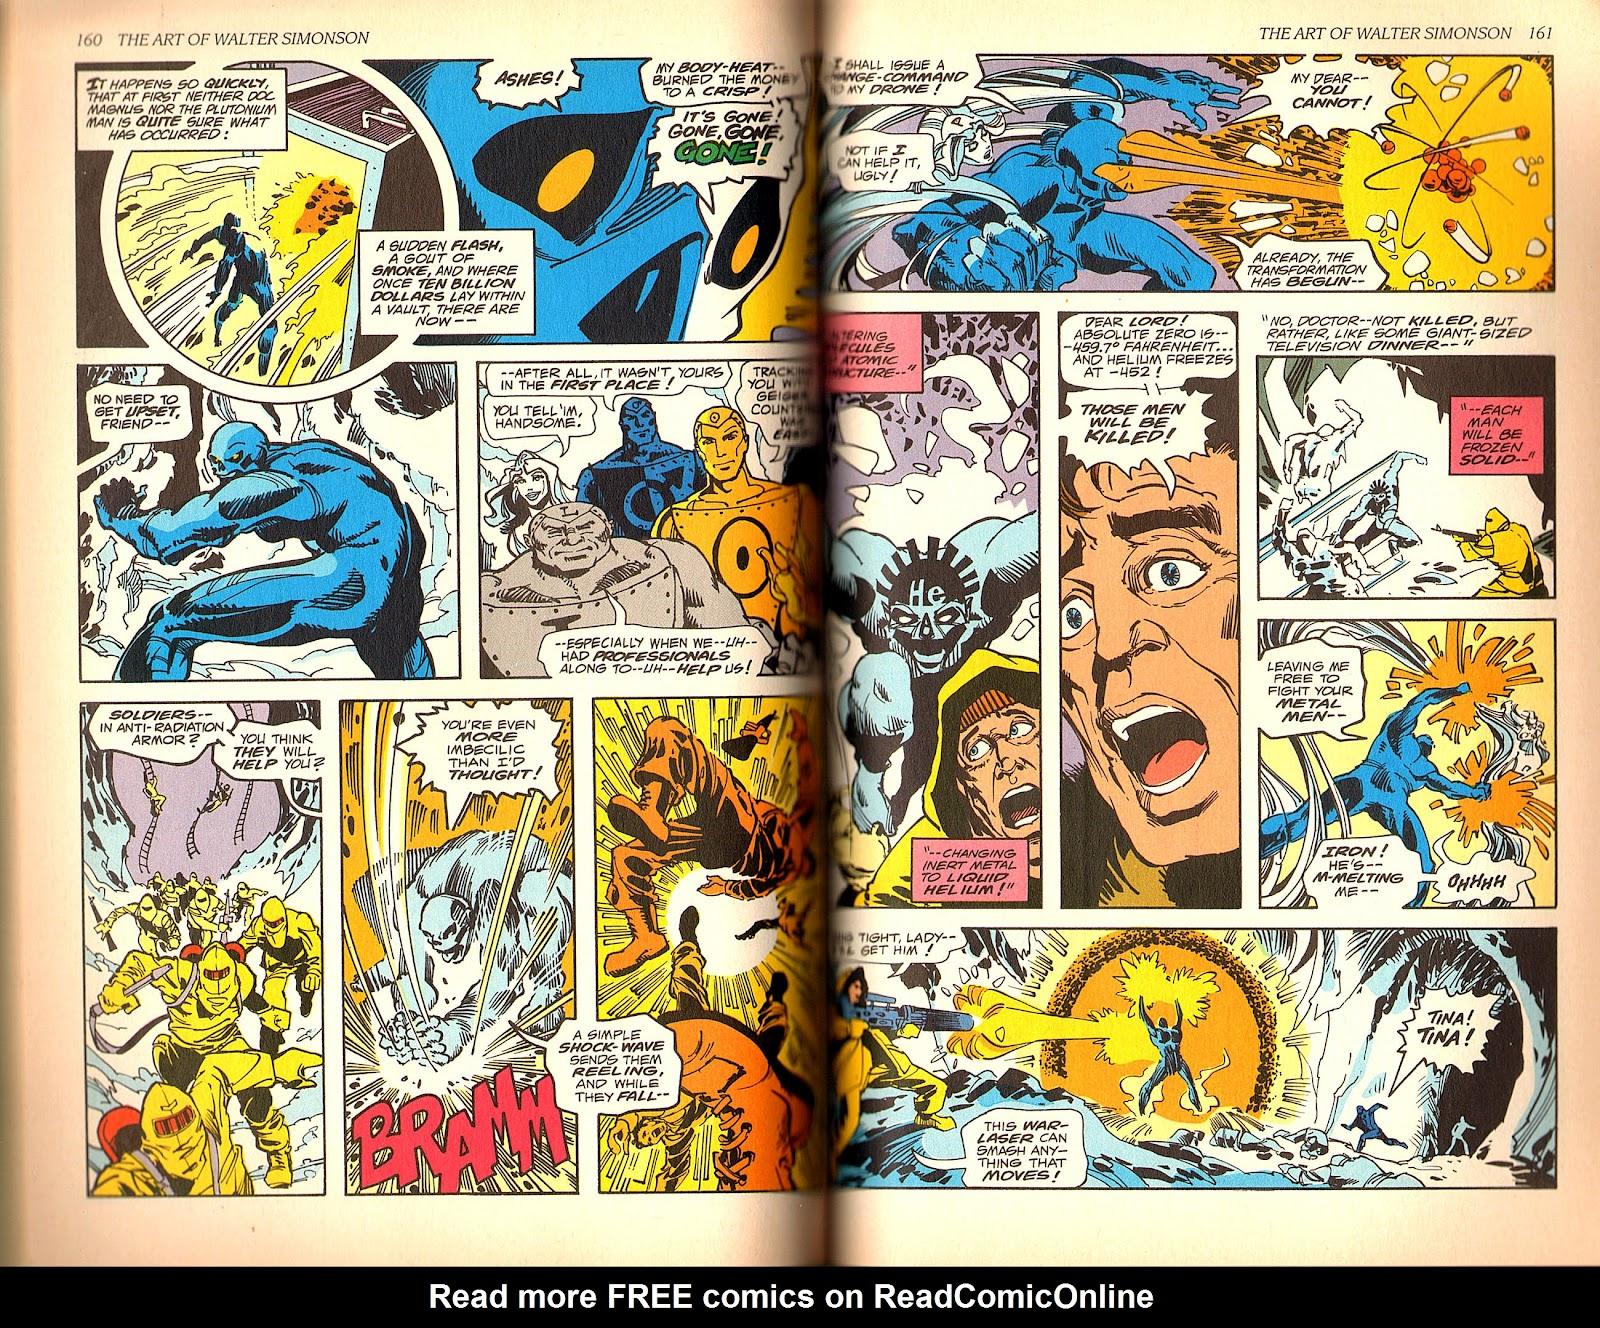 Read online The Art of Walter Simonson comic -  Issue # TPB - 82